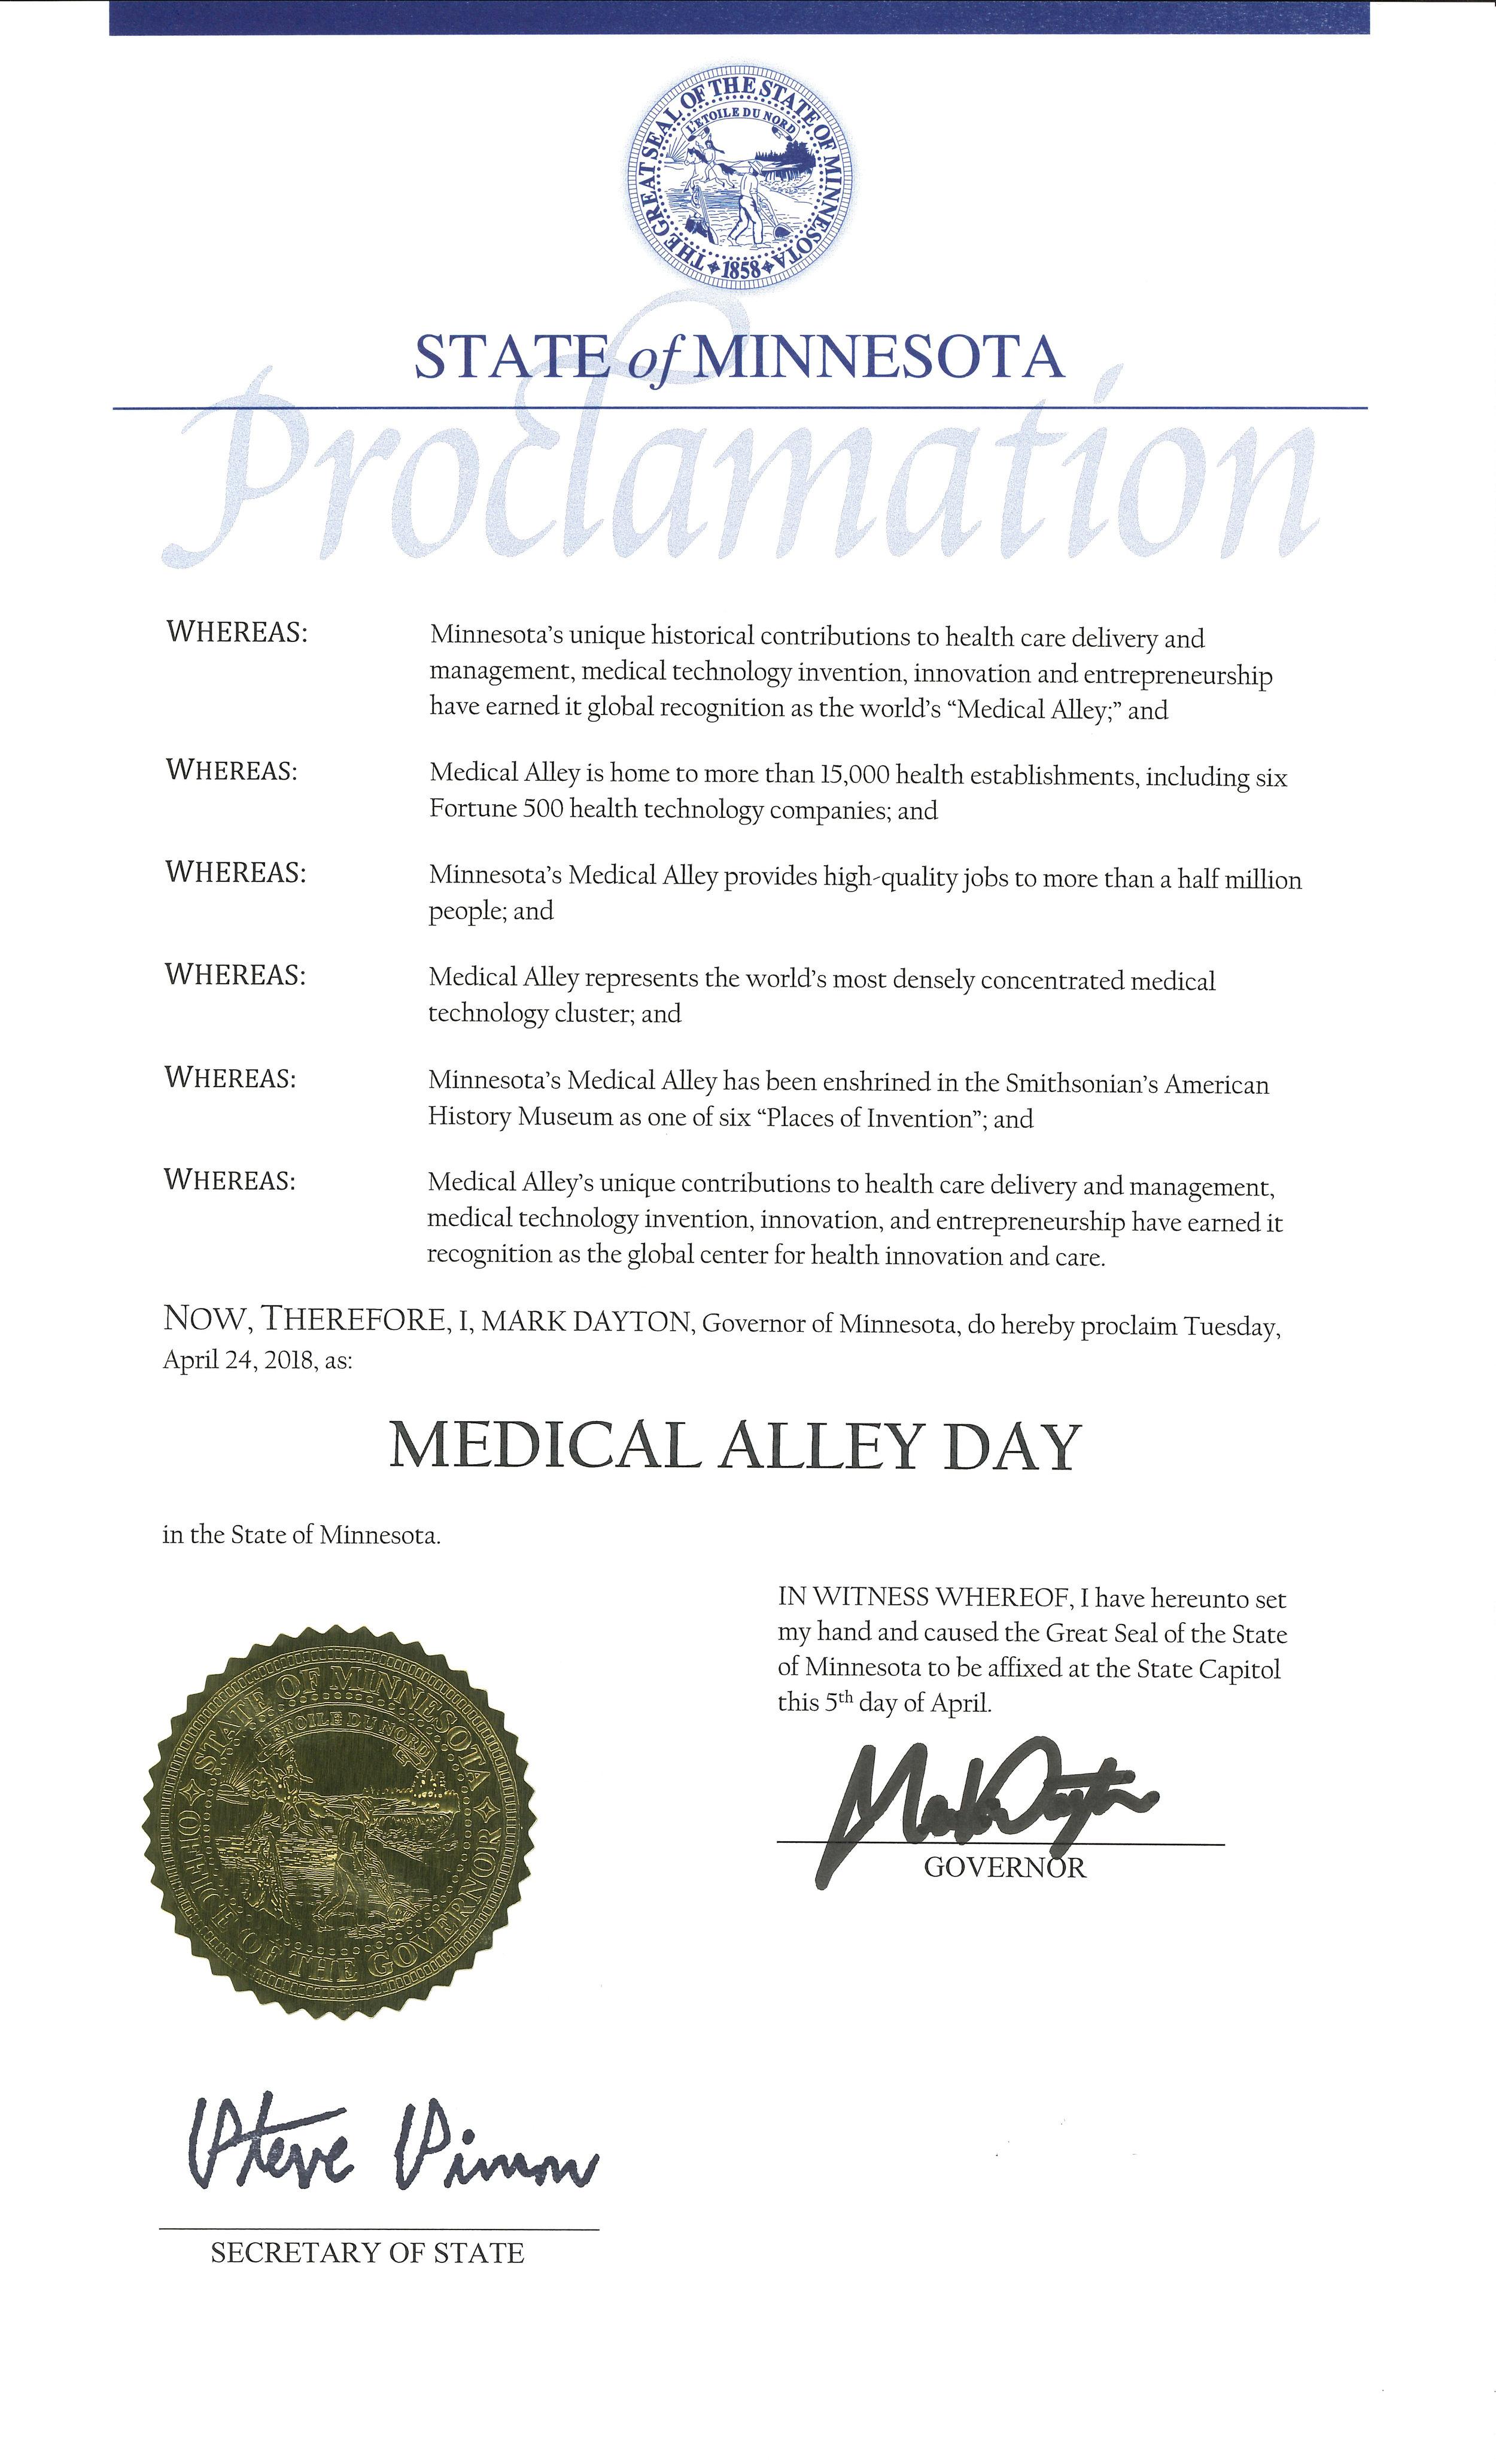 2018_04_24_Medical Alley Day.jpg